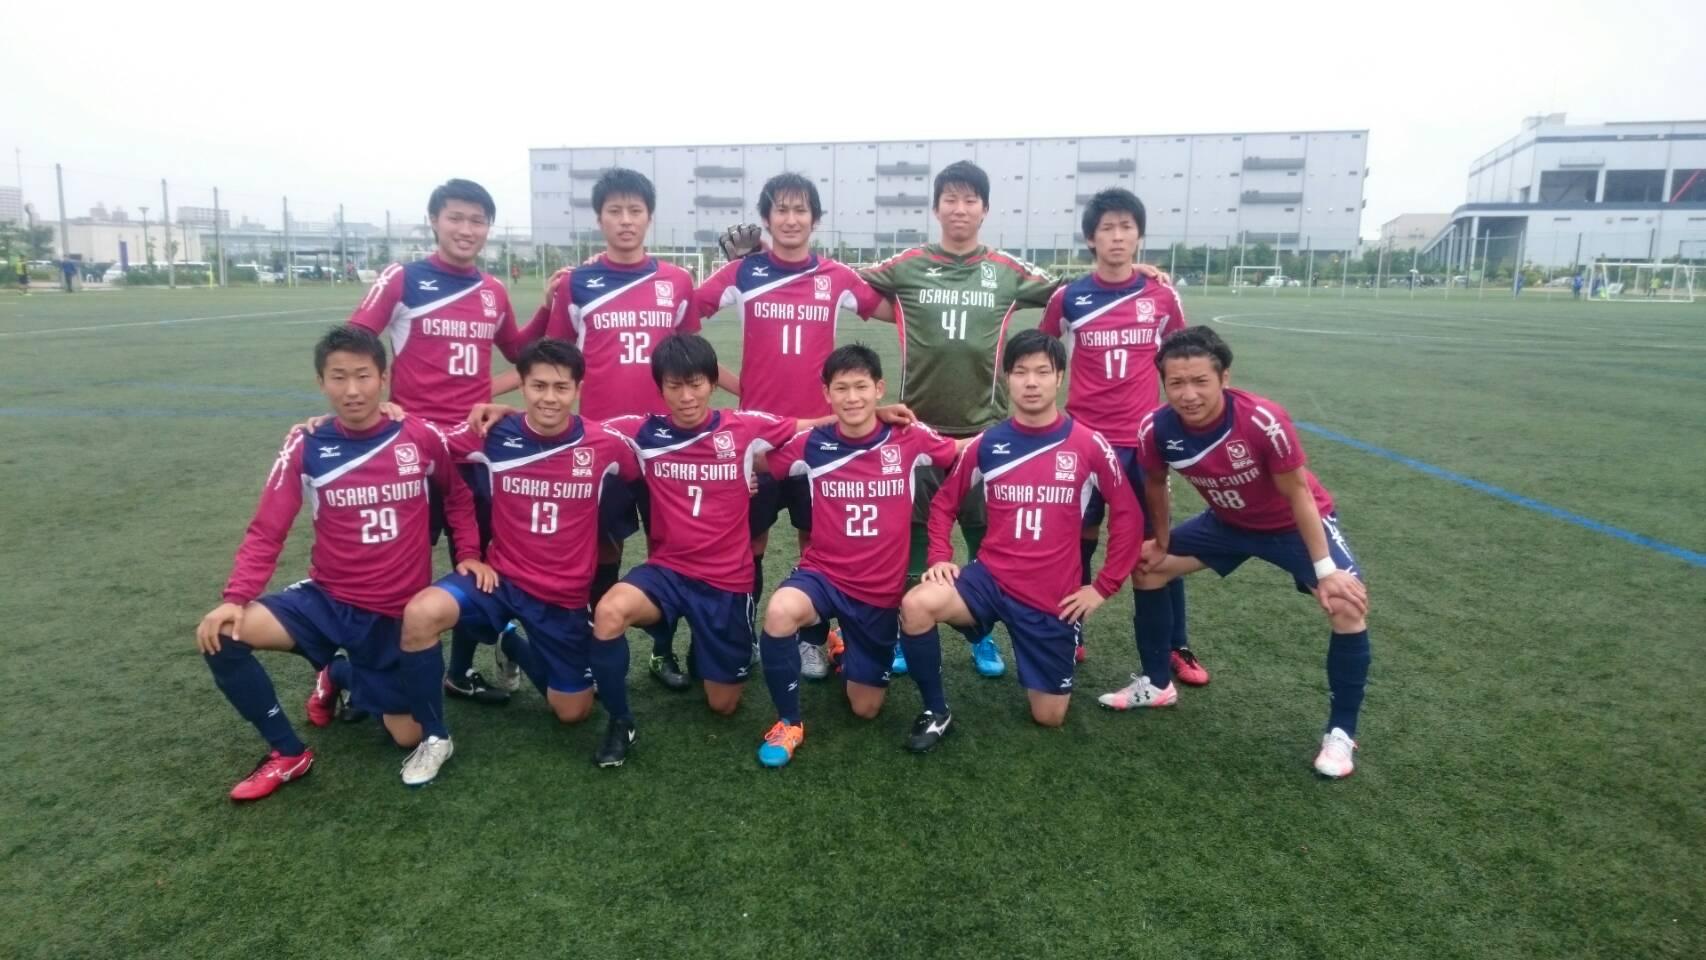 2016年 大阪府リーグ1部 第1節 vs SOGNO FC 試合前